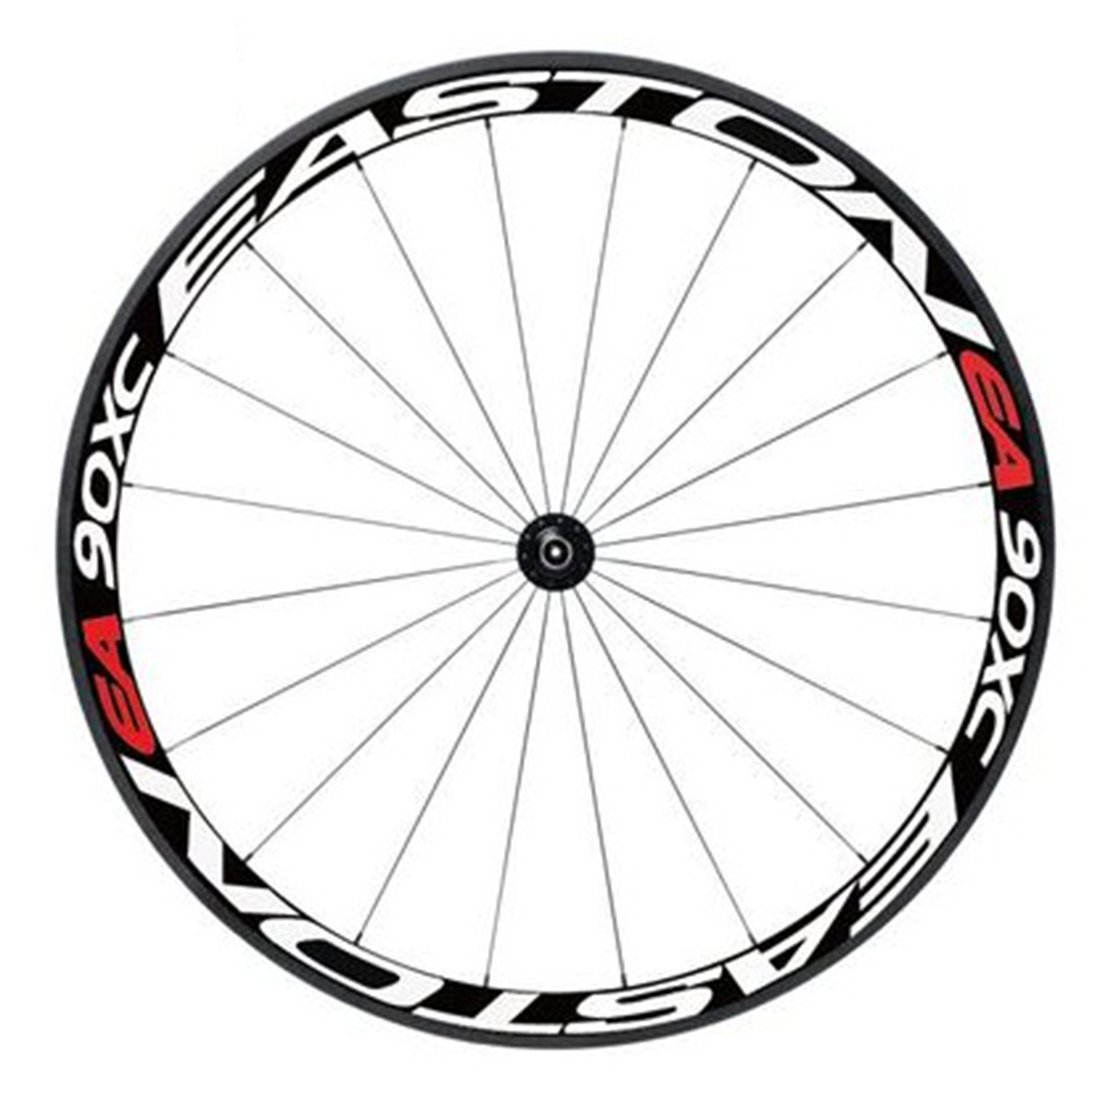 HMANE Bike Stickers, Bicycle Wheel Rims Light Reflective Stickers Decal